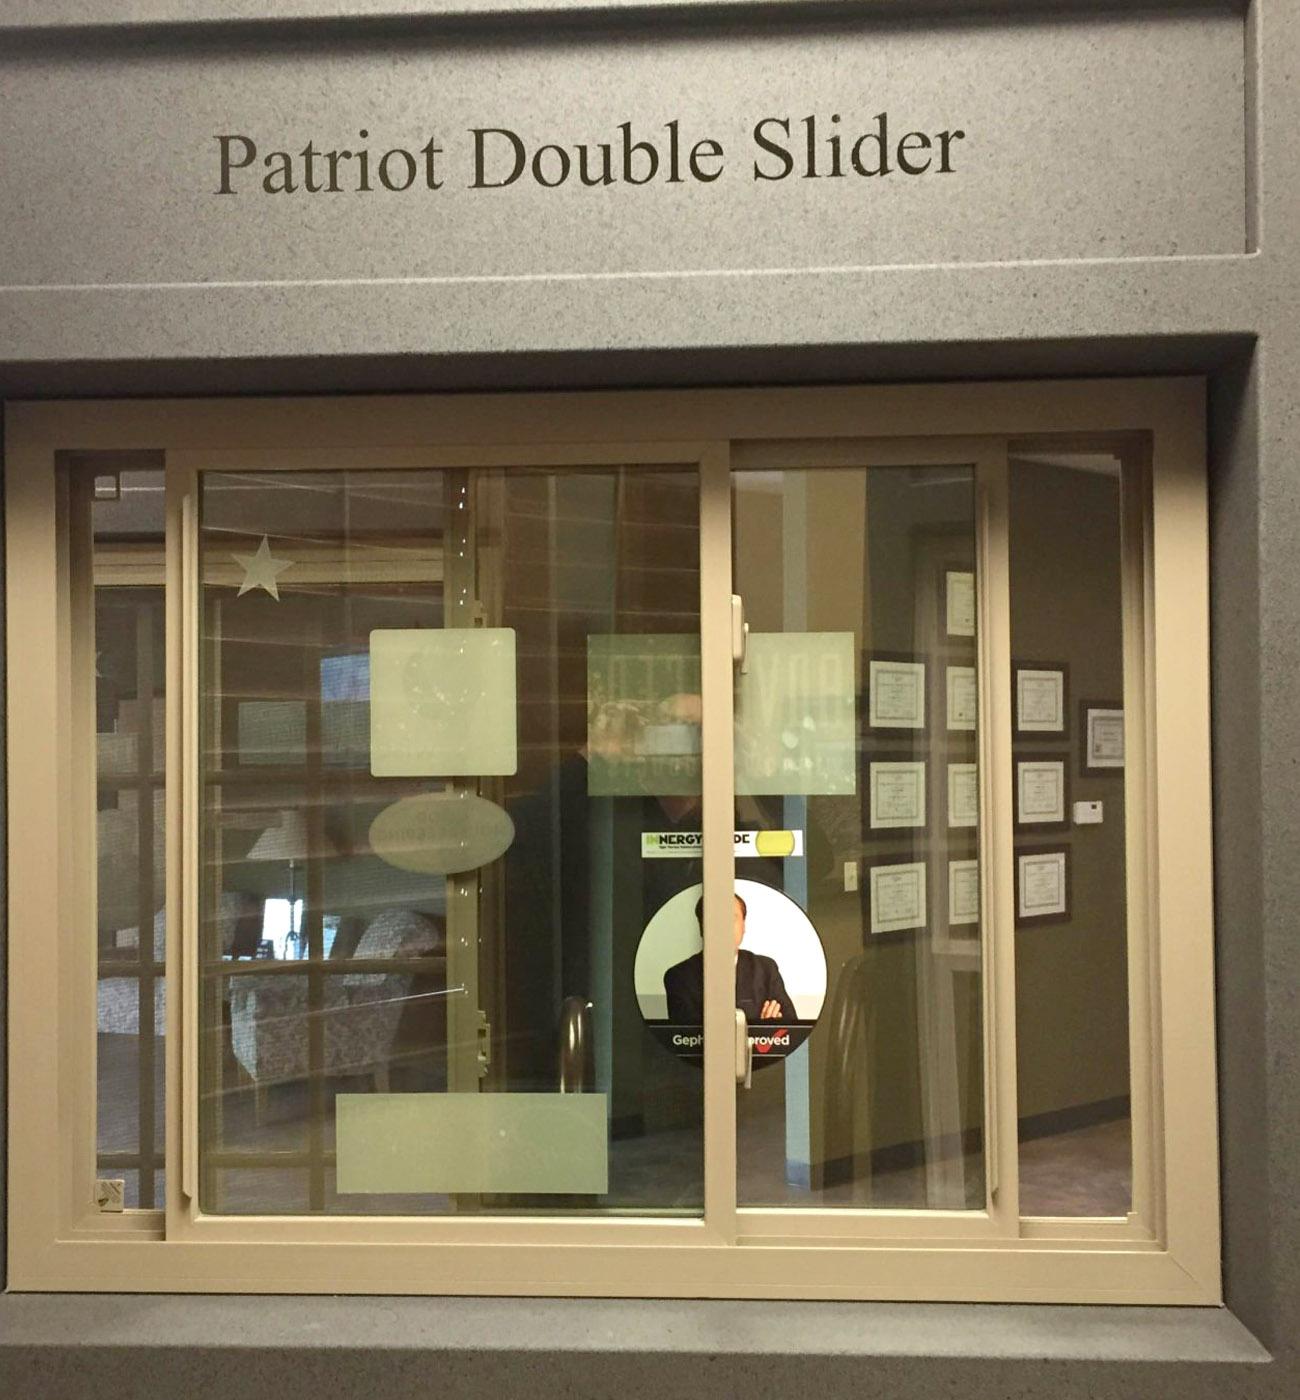 Double Slider Window Display - Advanced Window Products